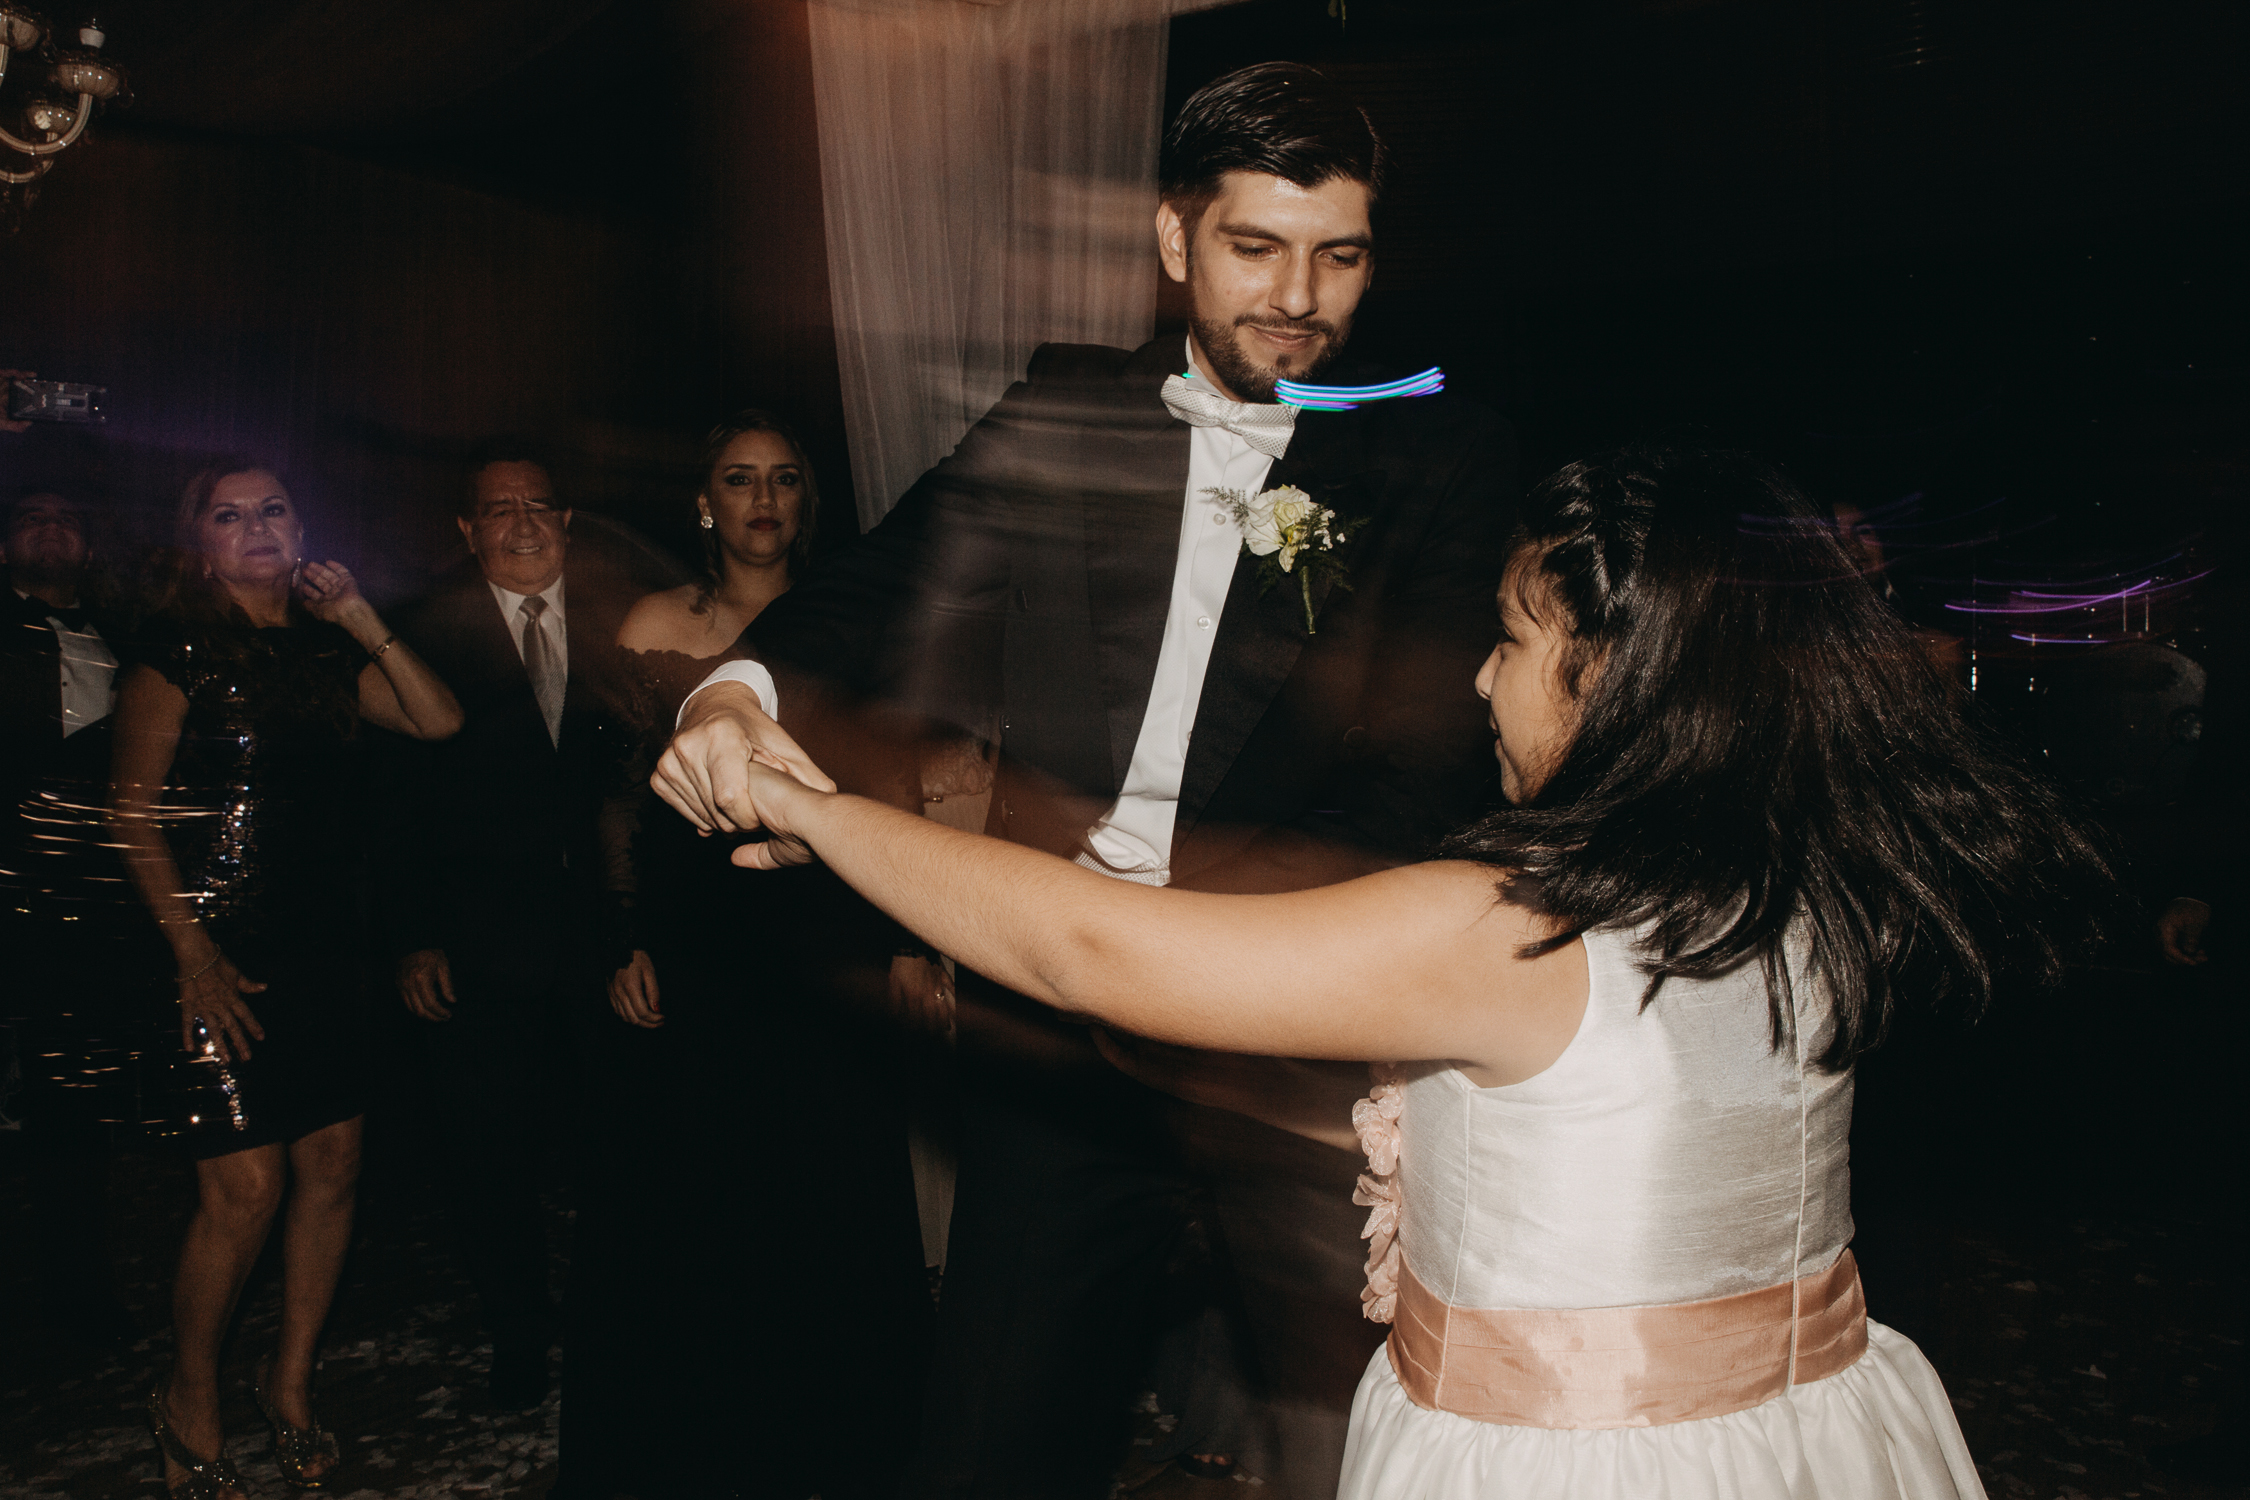 Michelle-Agurto-Fotografia-Bodas-Ecuador-Destination-Wedding-Photographer-Vicky-Javier-266.JPG